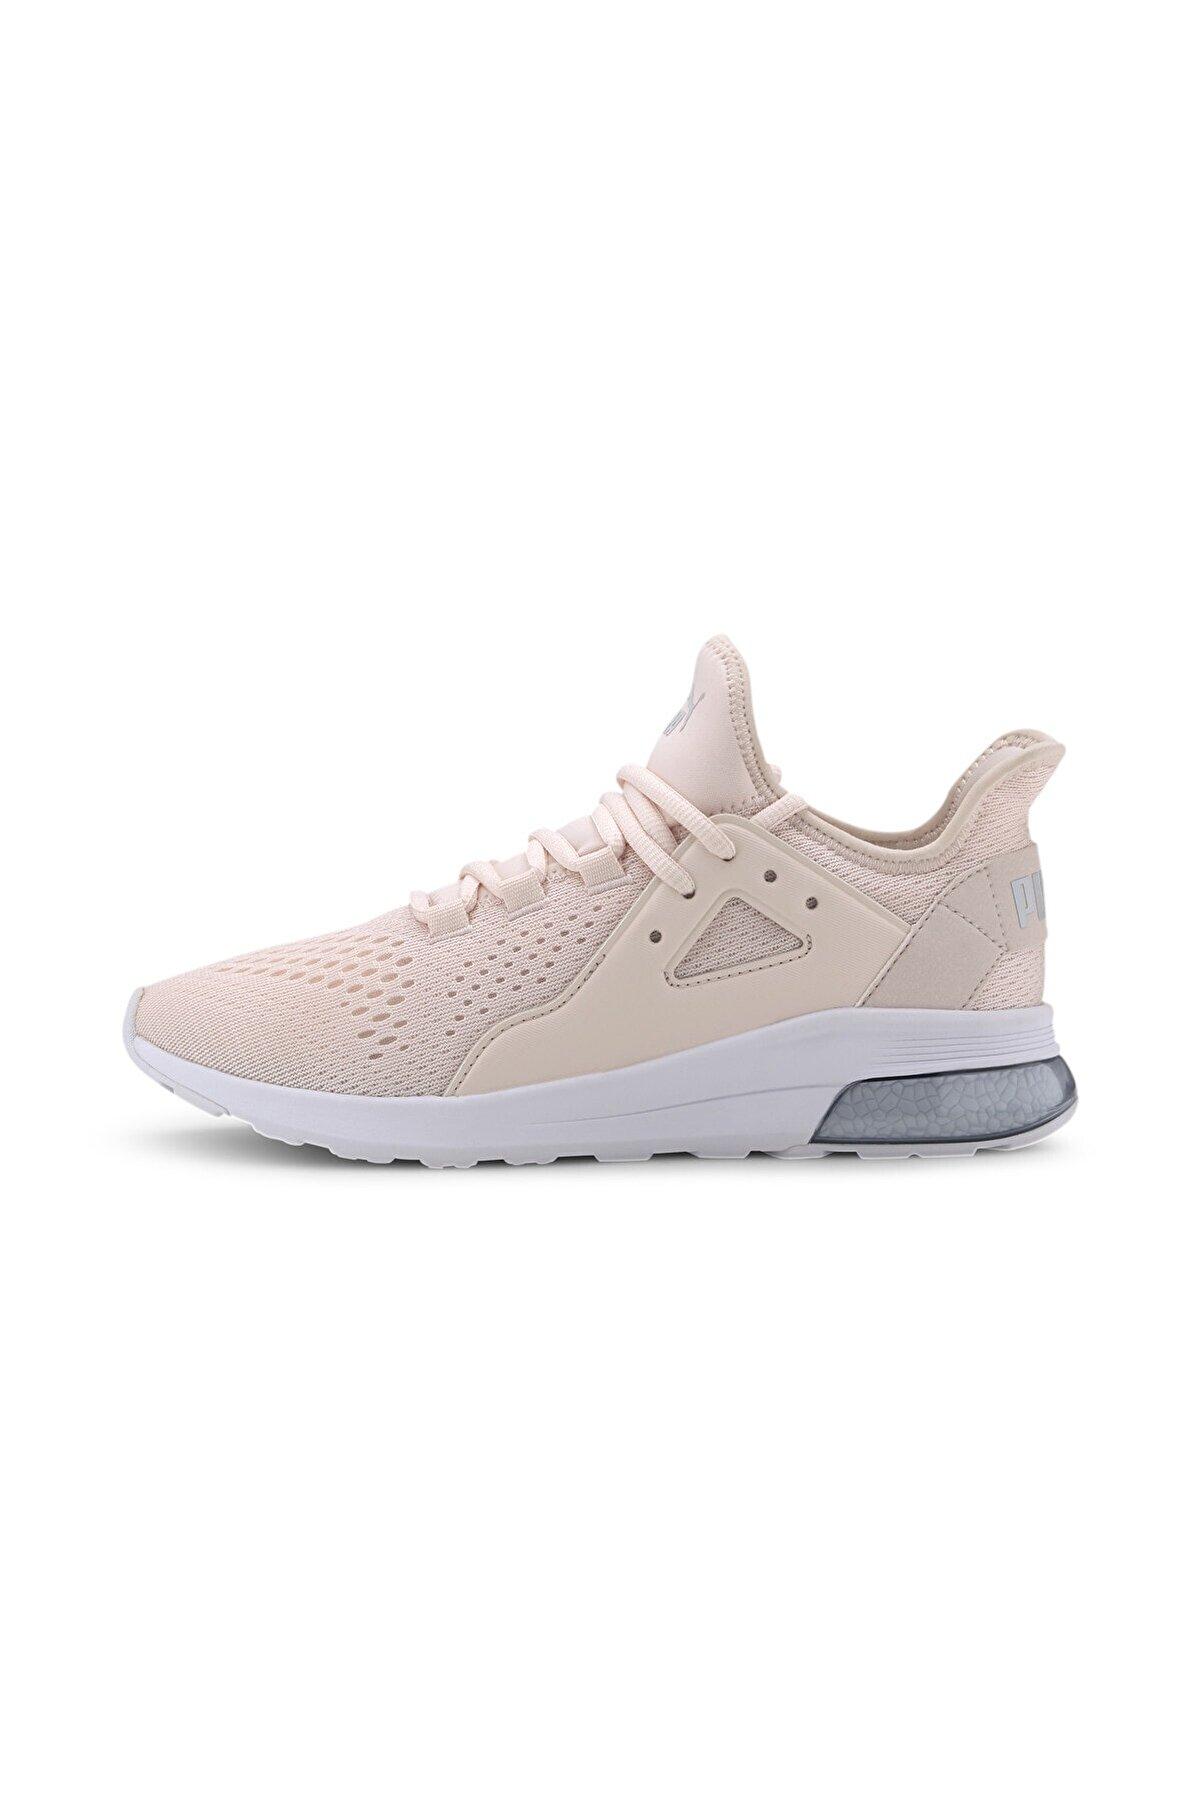 Puma Unisex Sneaker - Electron Street Mesh - 36912410